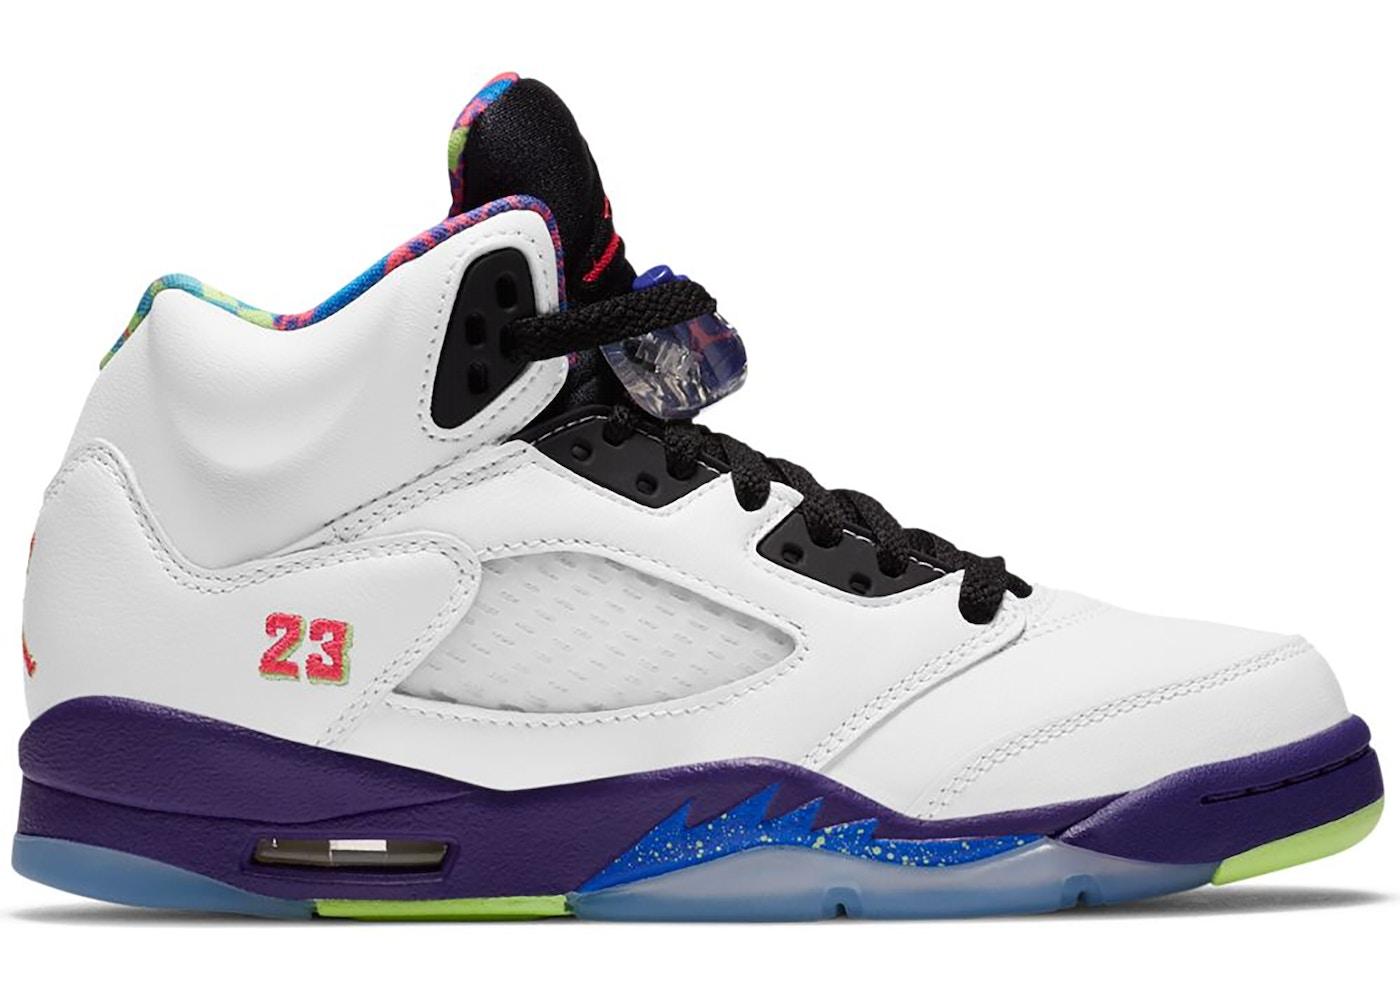 Acheter Air Jordan 5 Chaussures et sneakers neuves